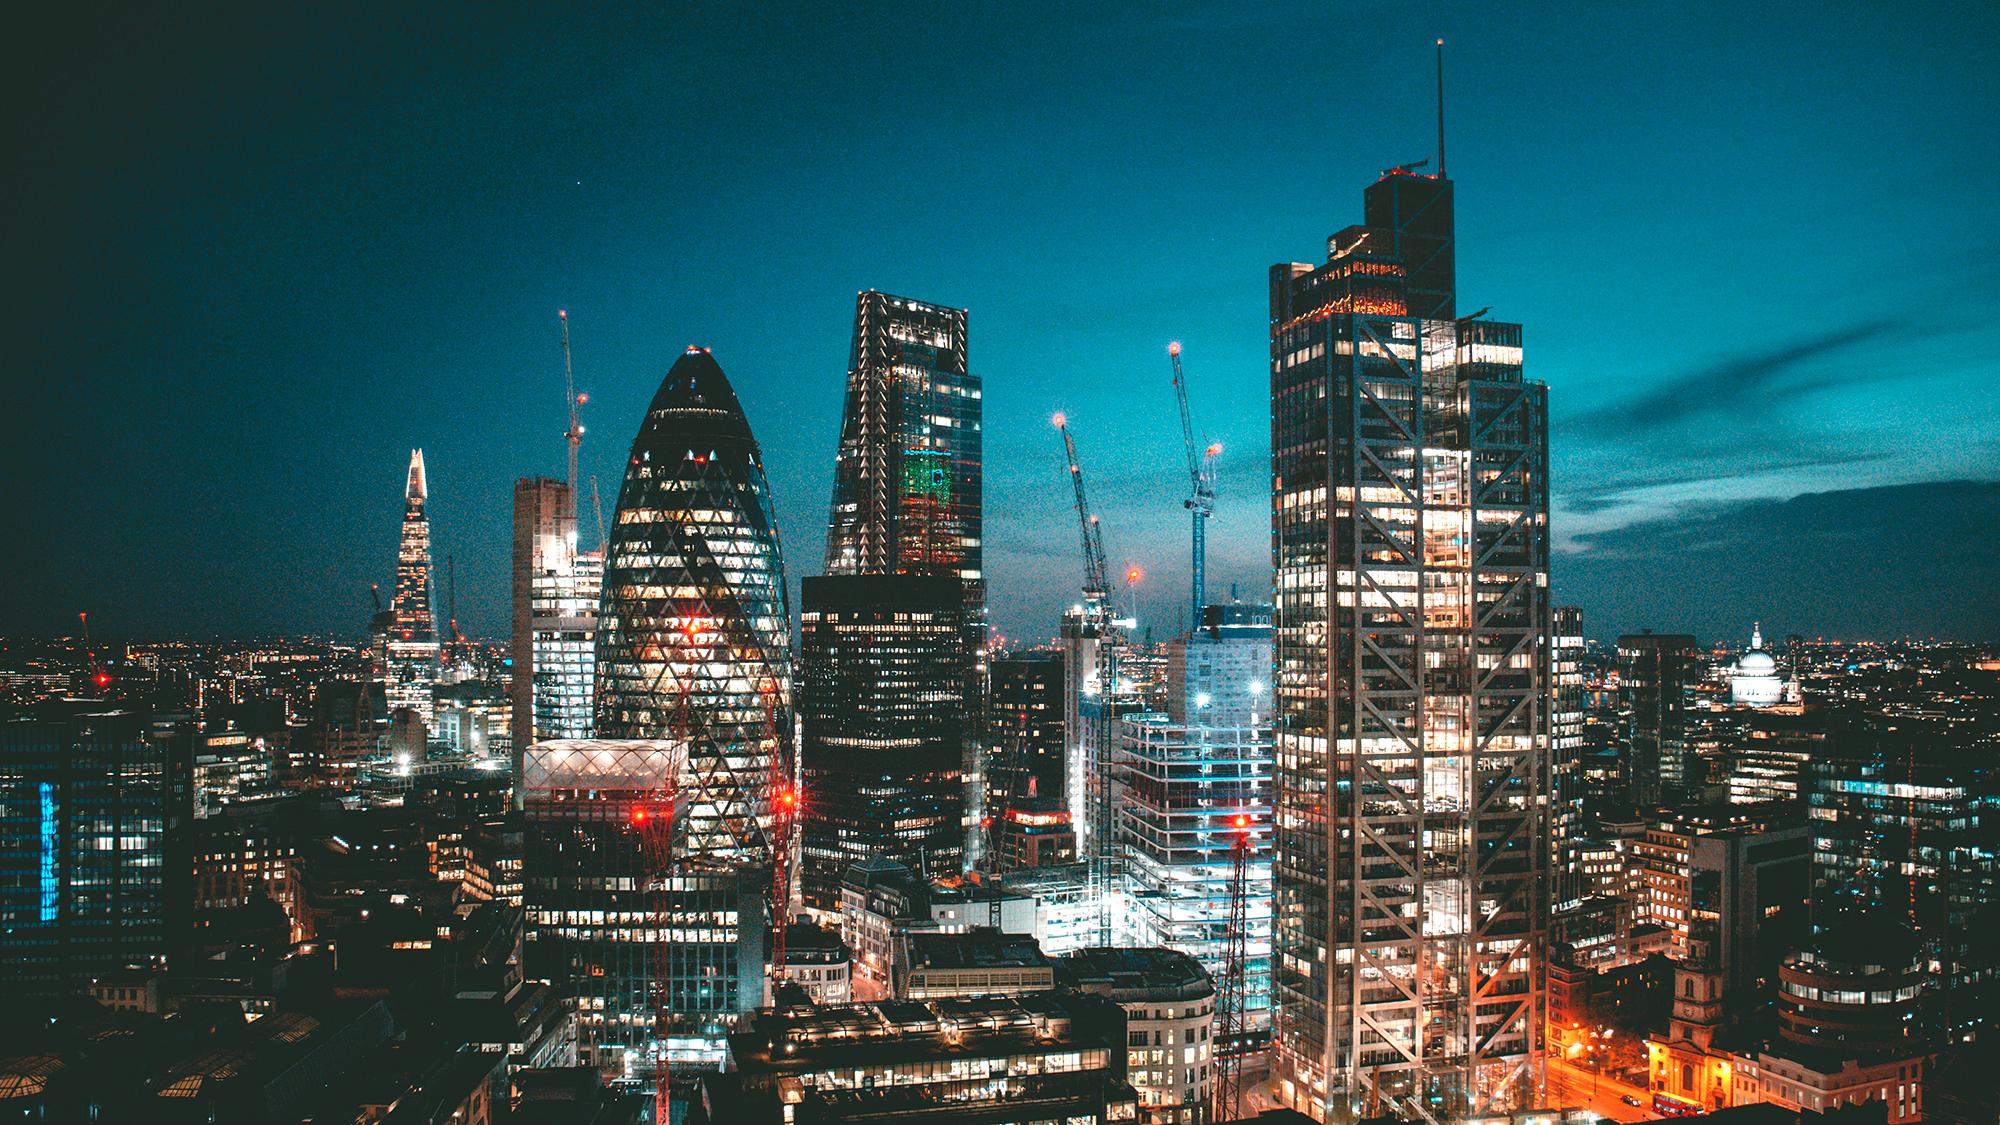 London city night skyline